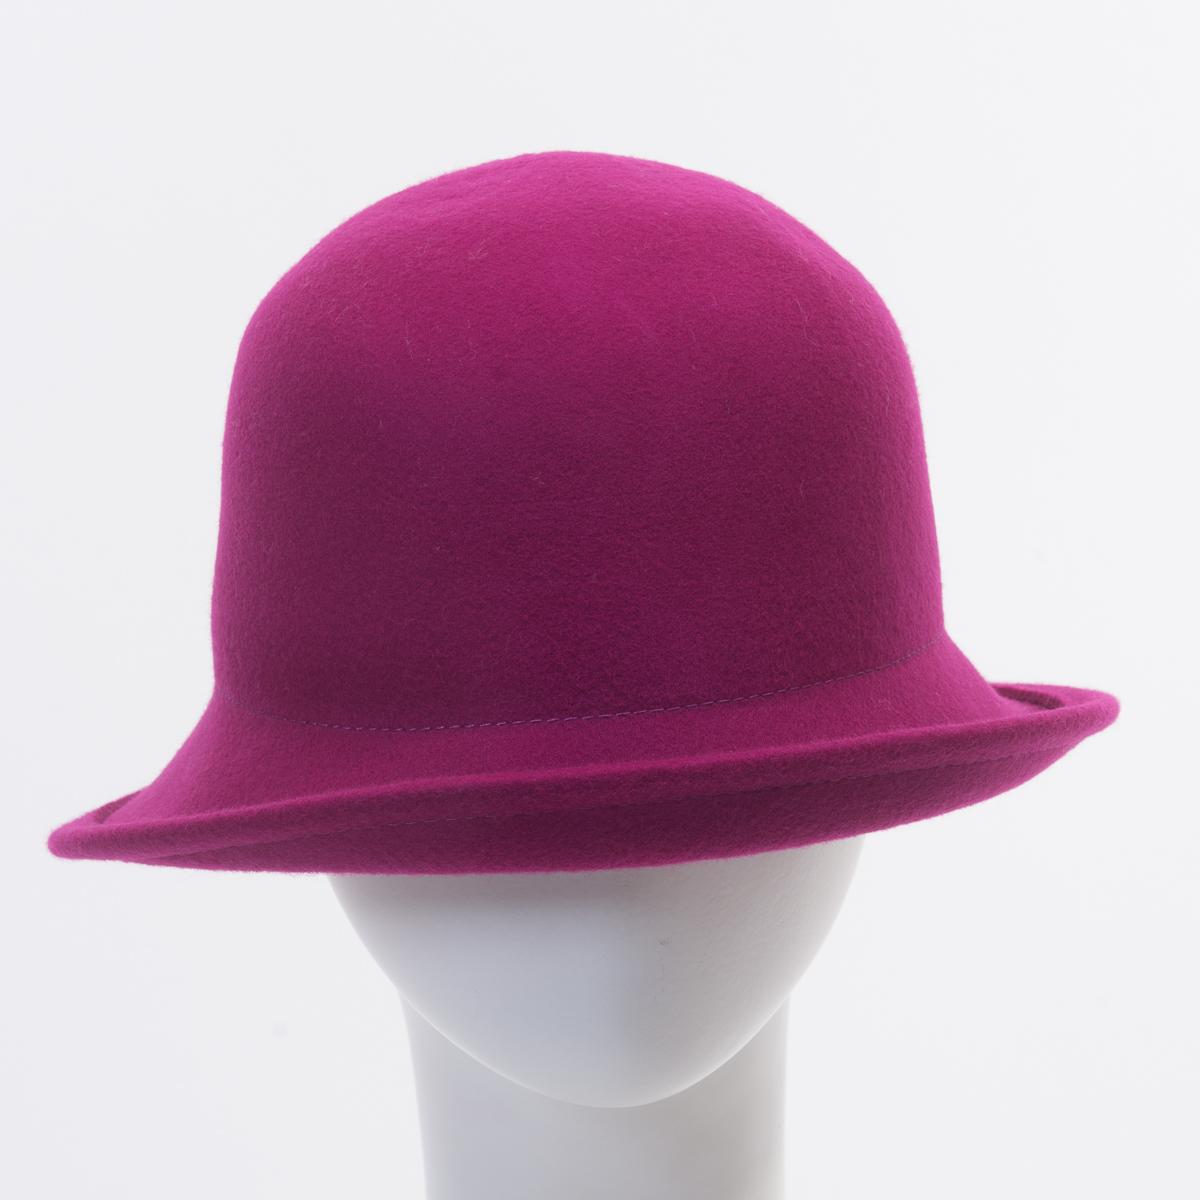 bd1bee6216c FUCHSIA Off Face Cloche Felt Plain Hats-W6015A-FUCHSIA- Sun Yorkos ...